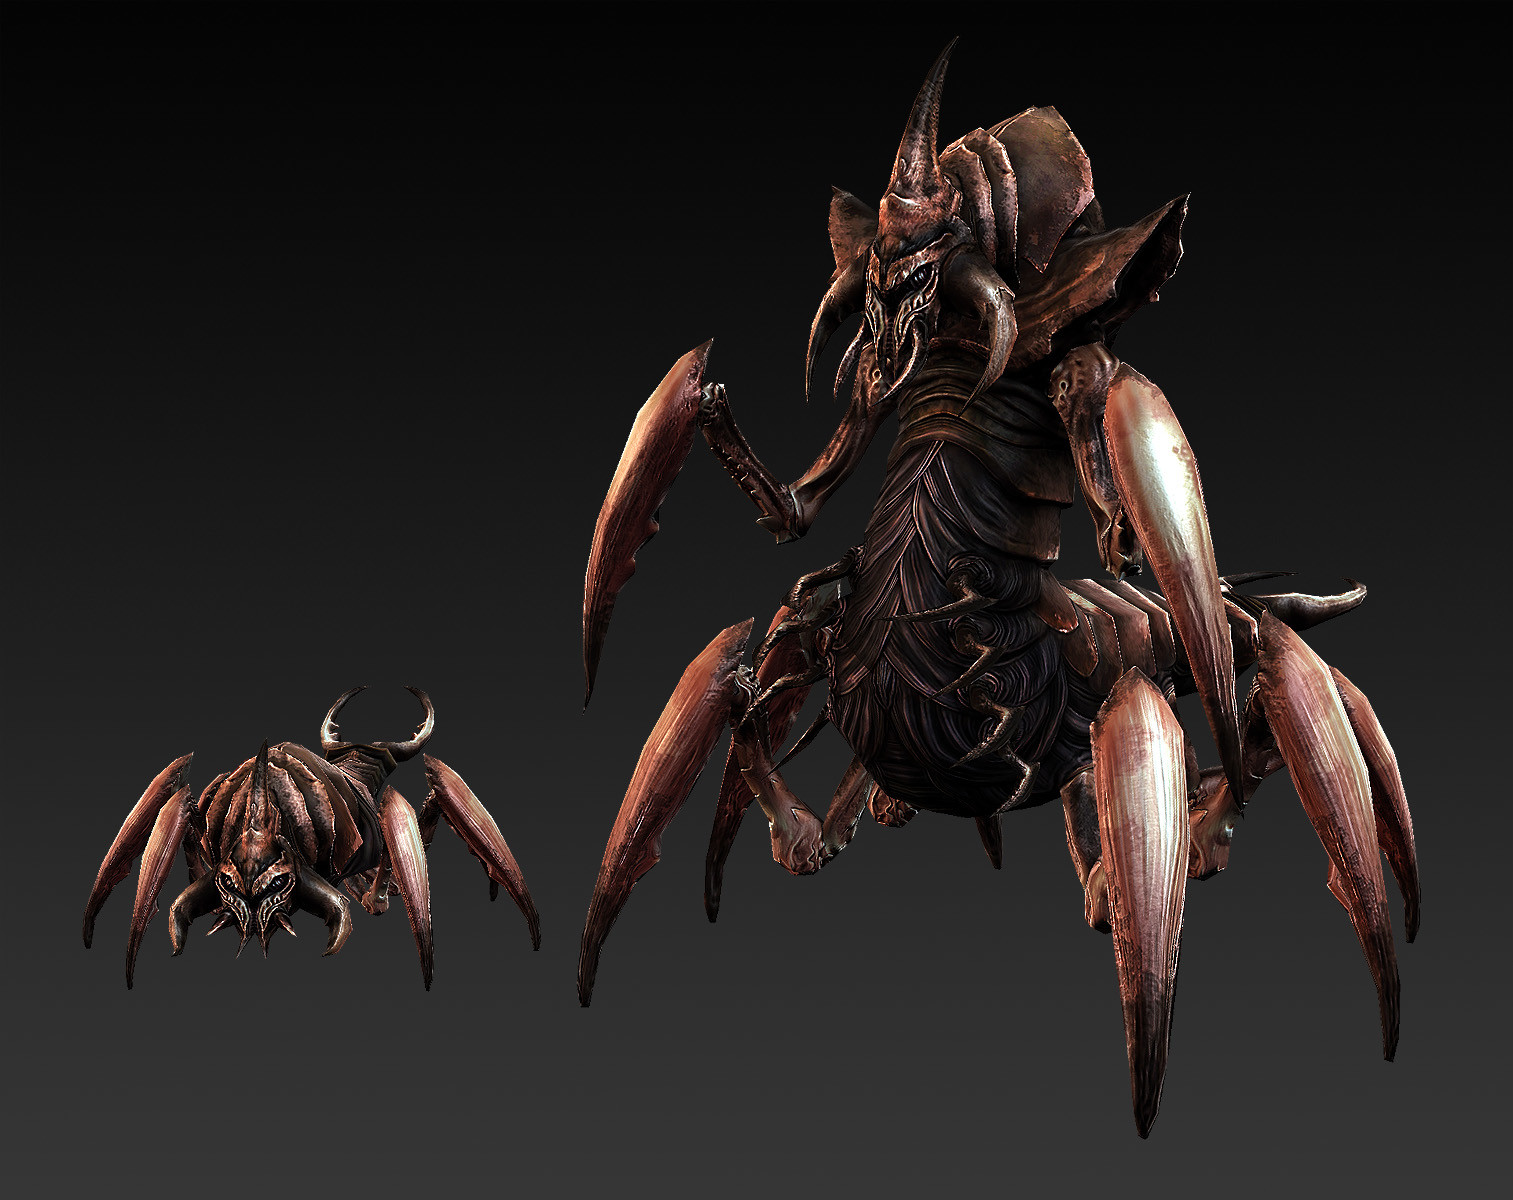 Dani santos bugsbugs2